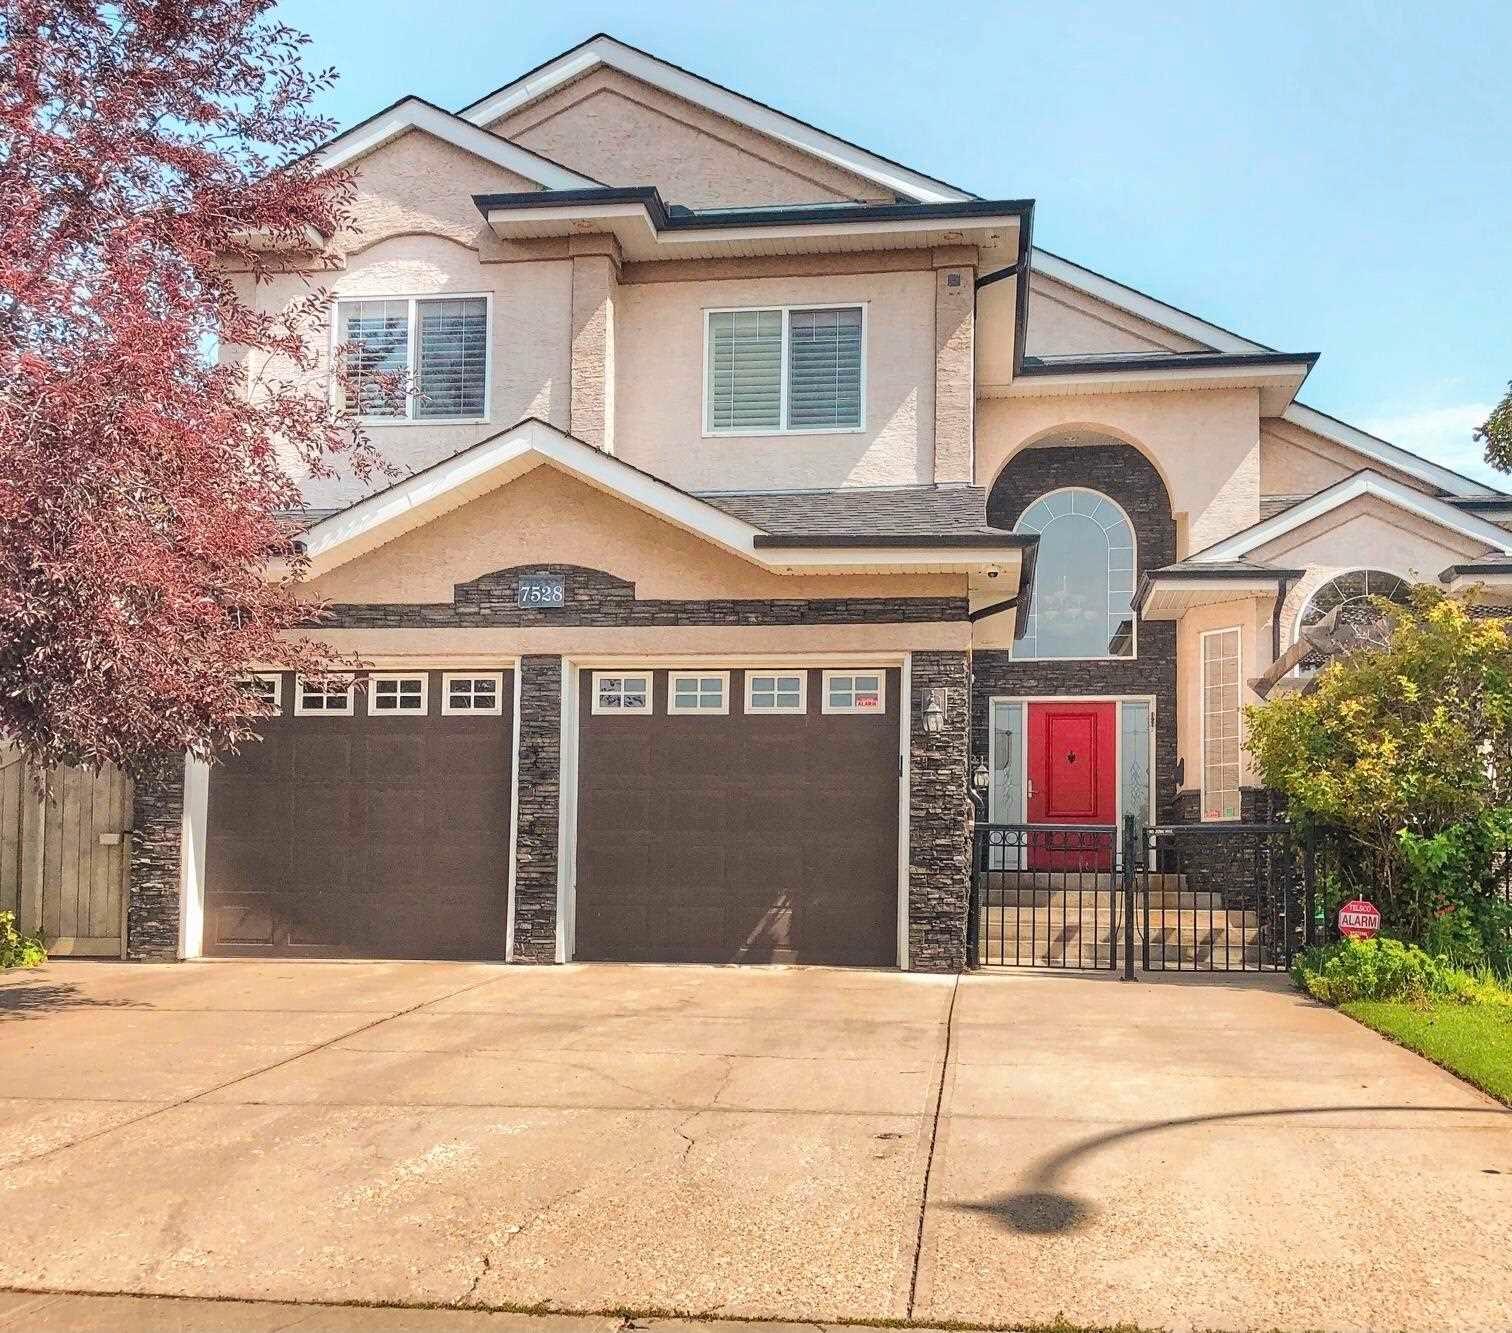 Main Photo: 7528 161A Avenue in Edmonton: Zone 28 House for sale : MLS®# E4254279